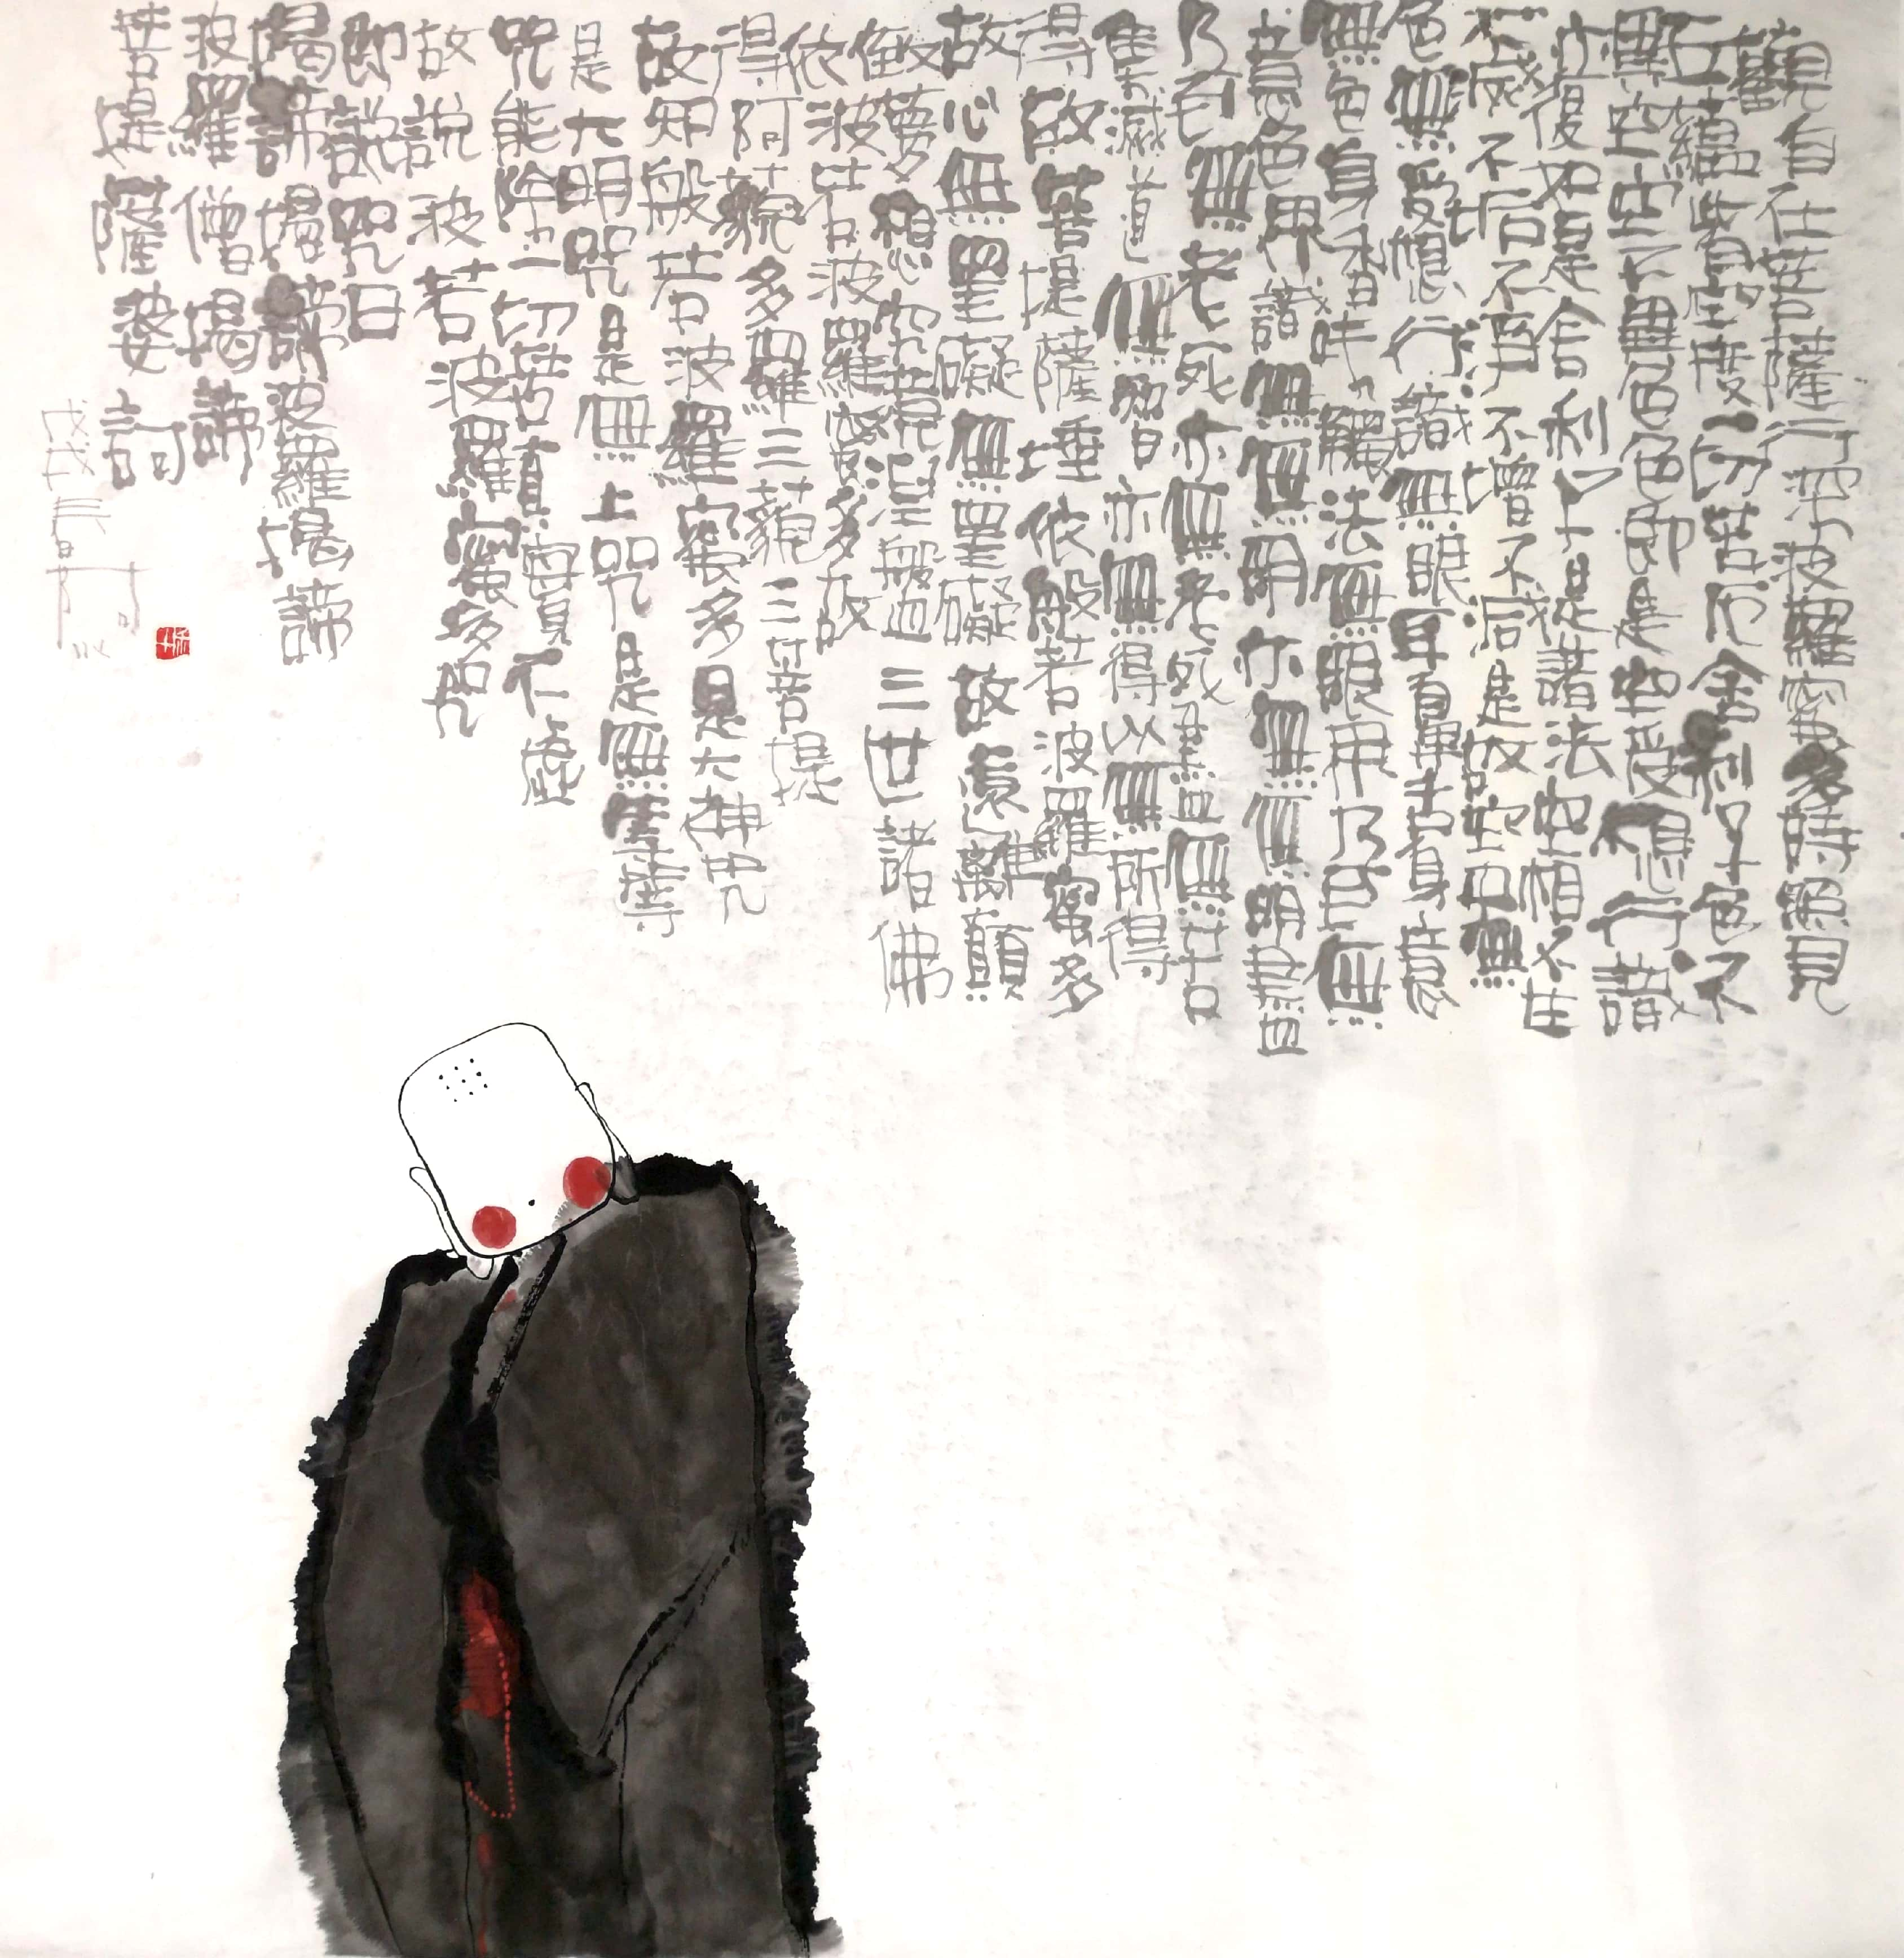 心經小沙彌 The Heart Sutra